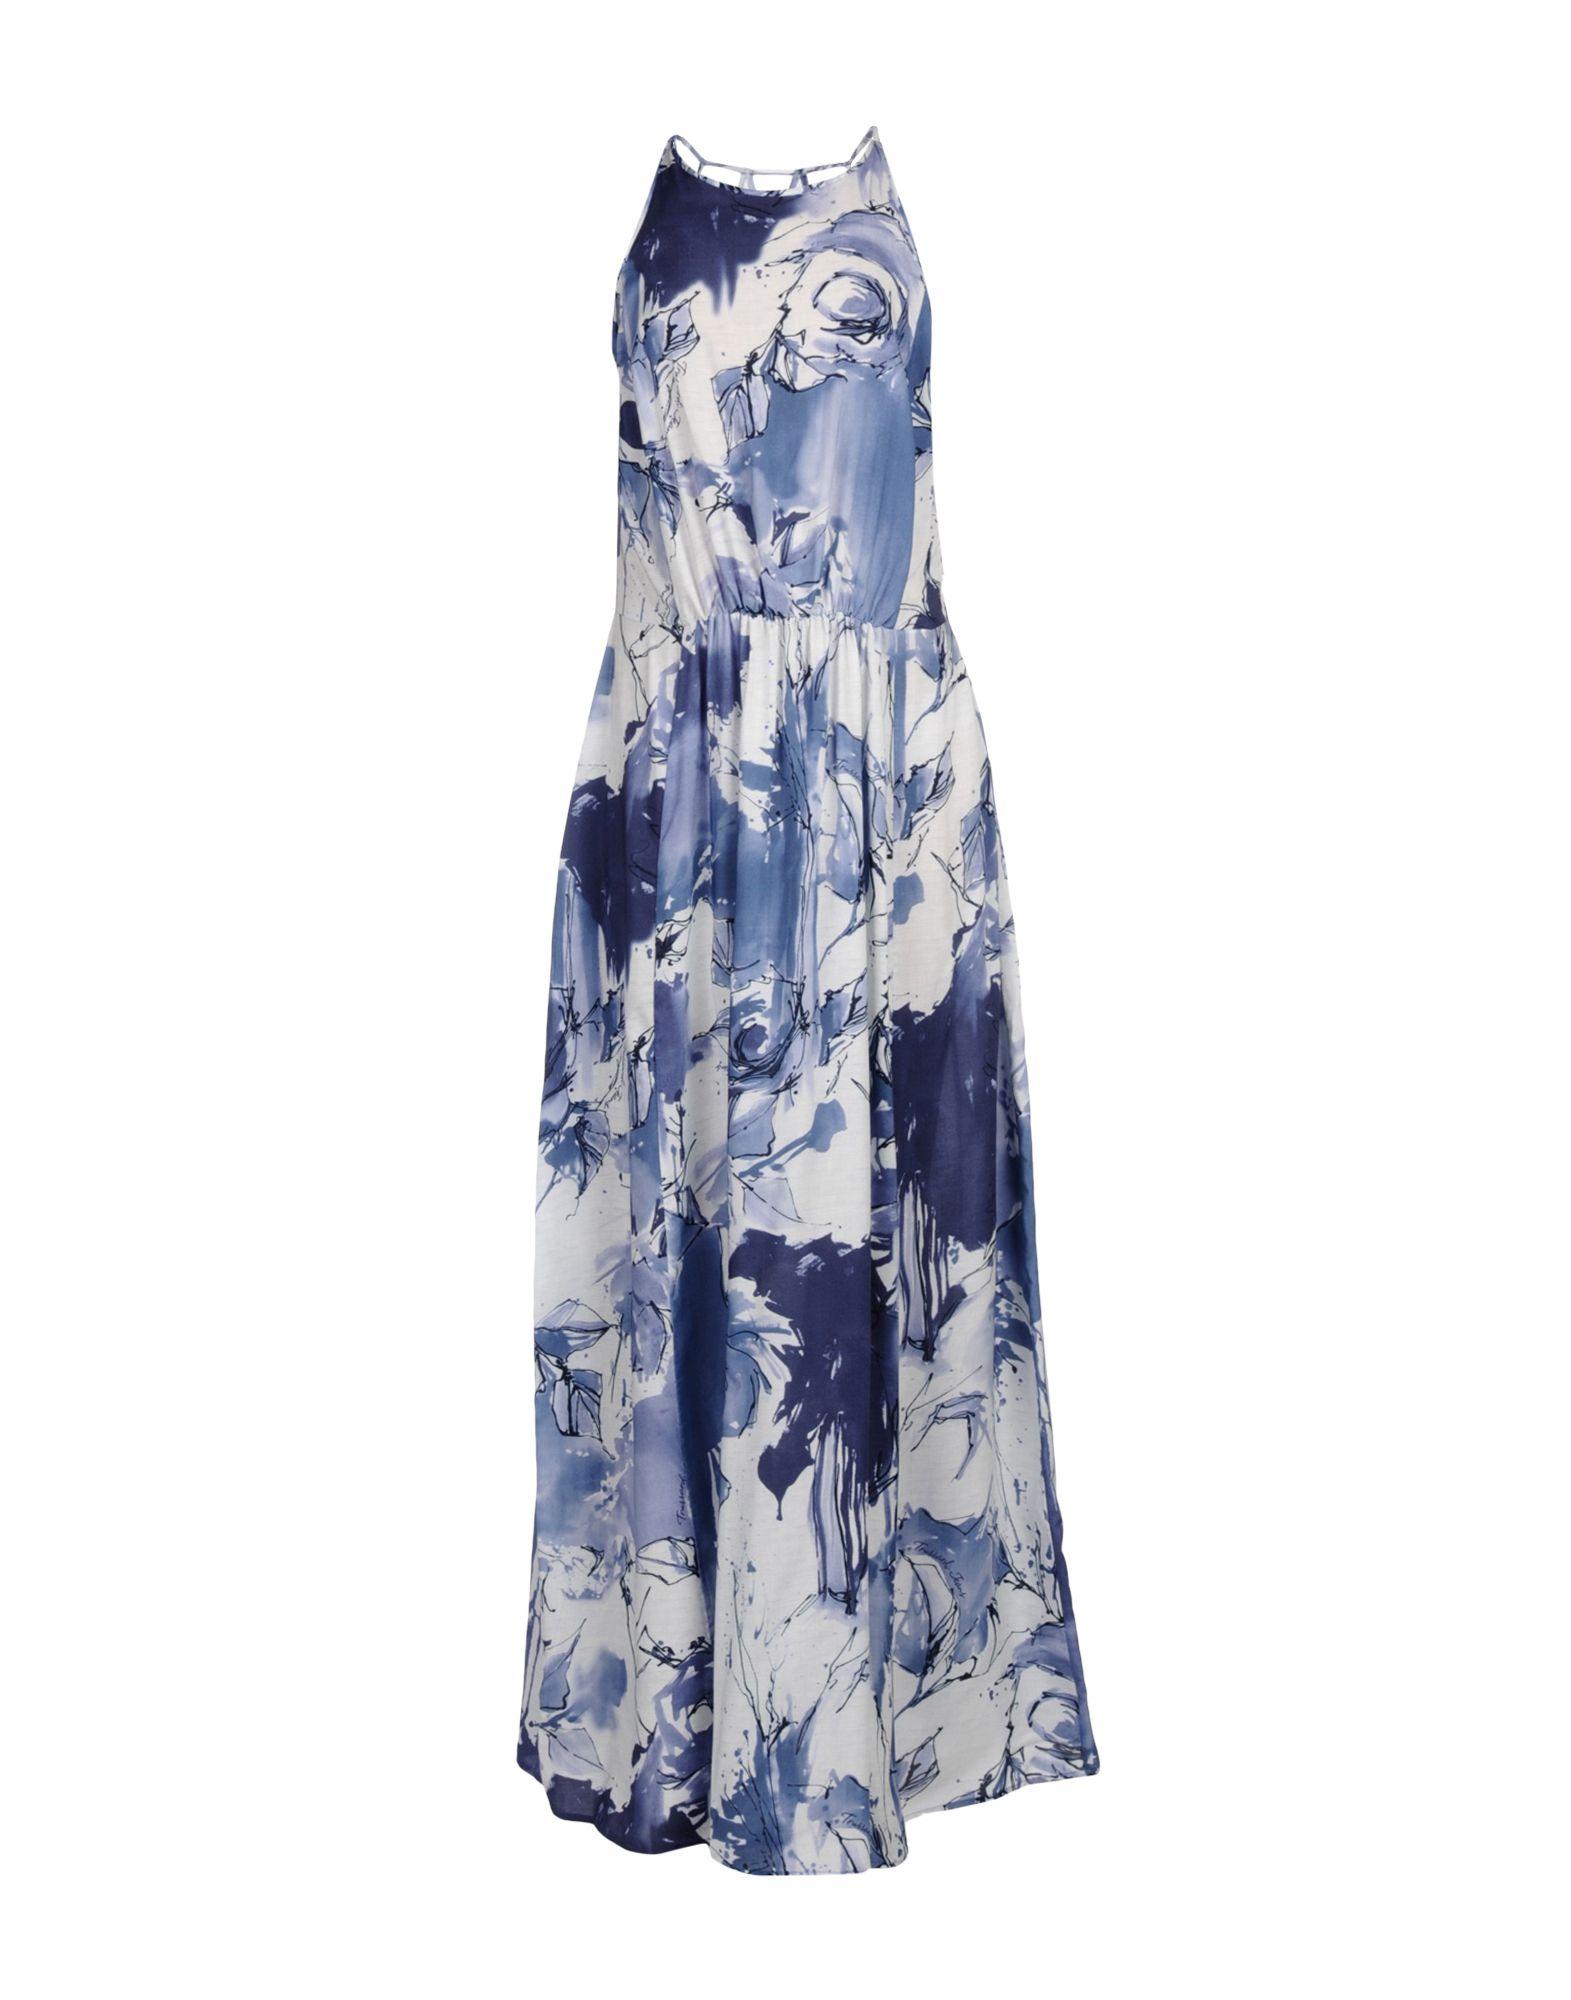 Vestito Lungo Trussardi Jeans Donna - Acquista online su 0BxcLM4